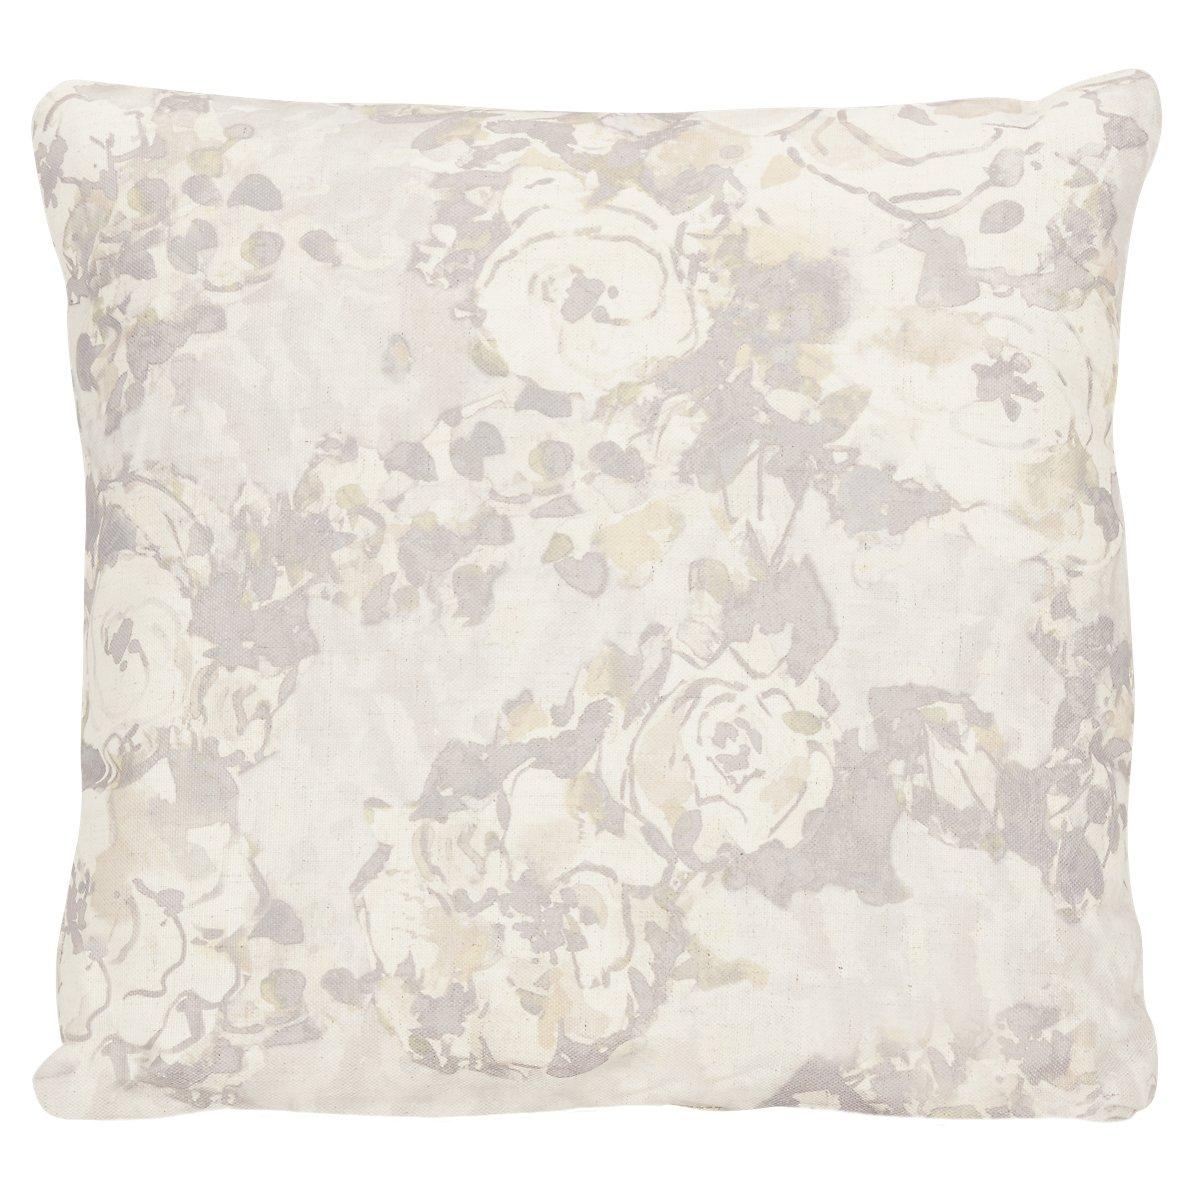 Primrose Gray Fabric Square Accent Pillow